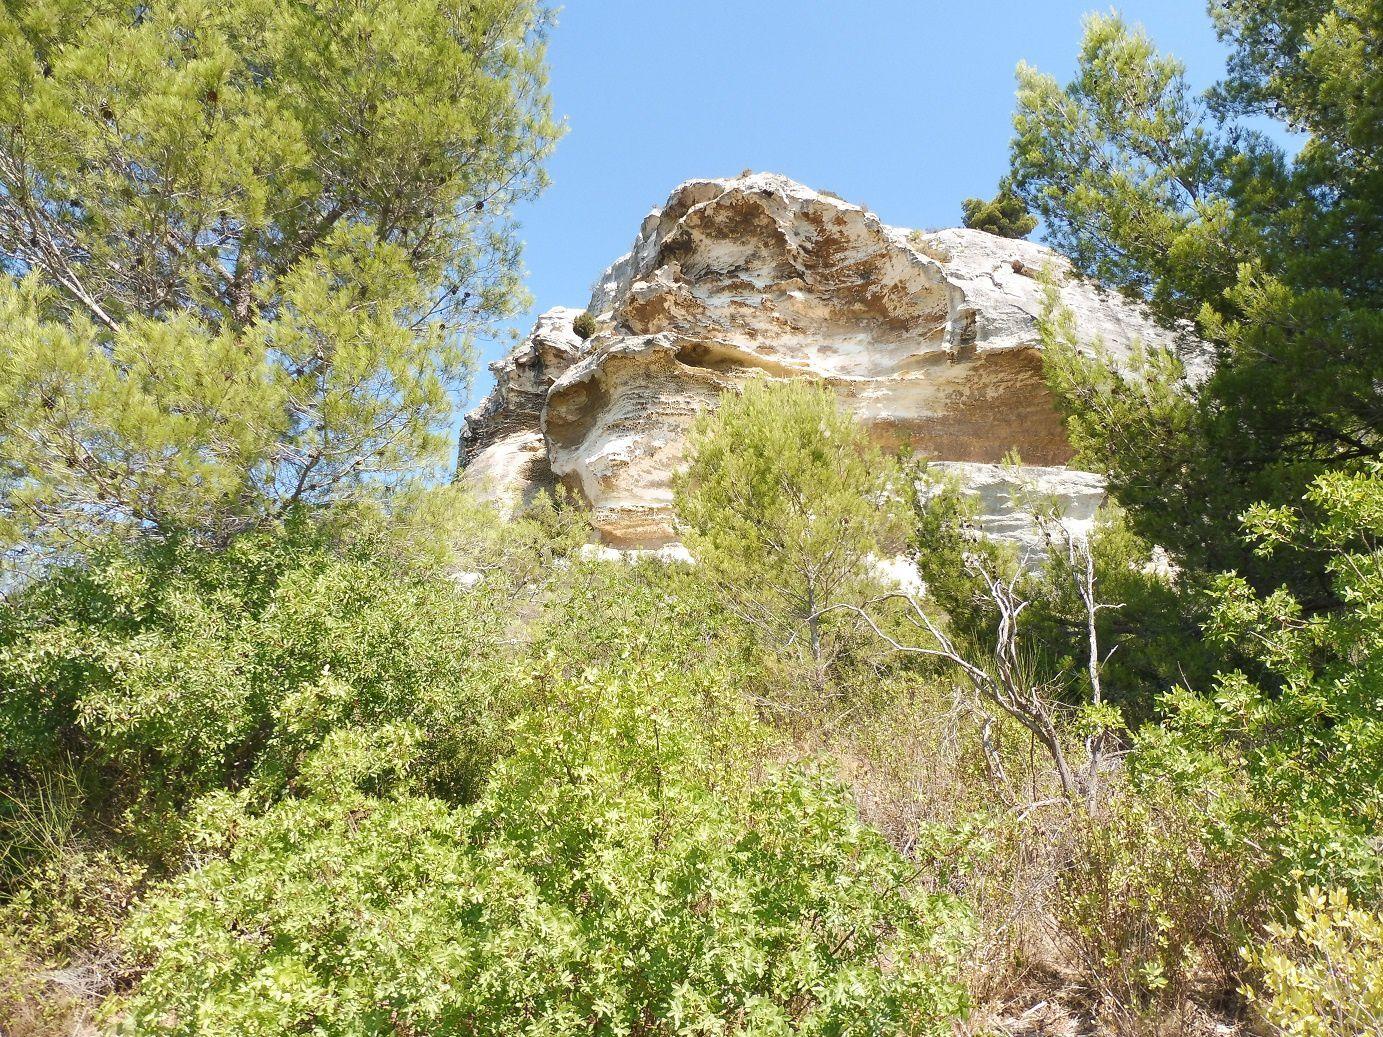 Etrange forme de ce rocher.